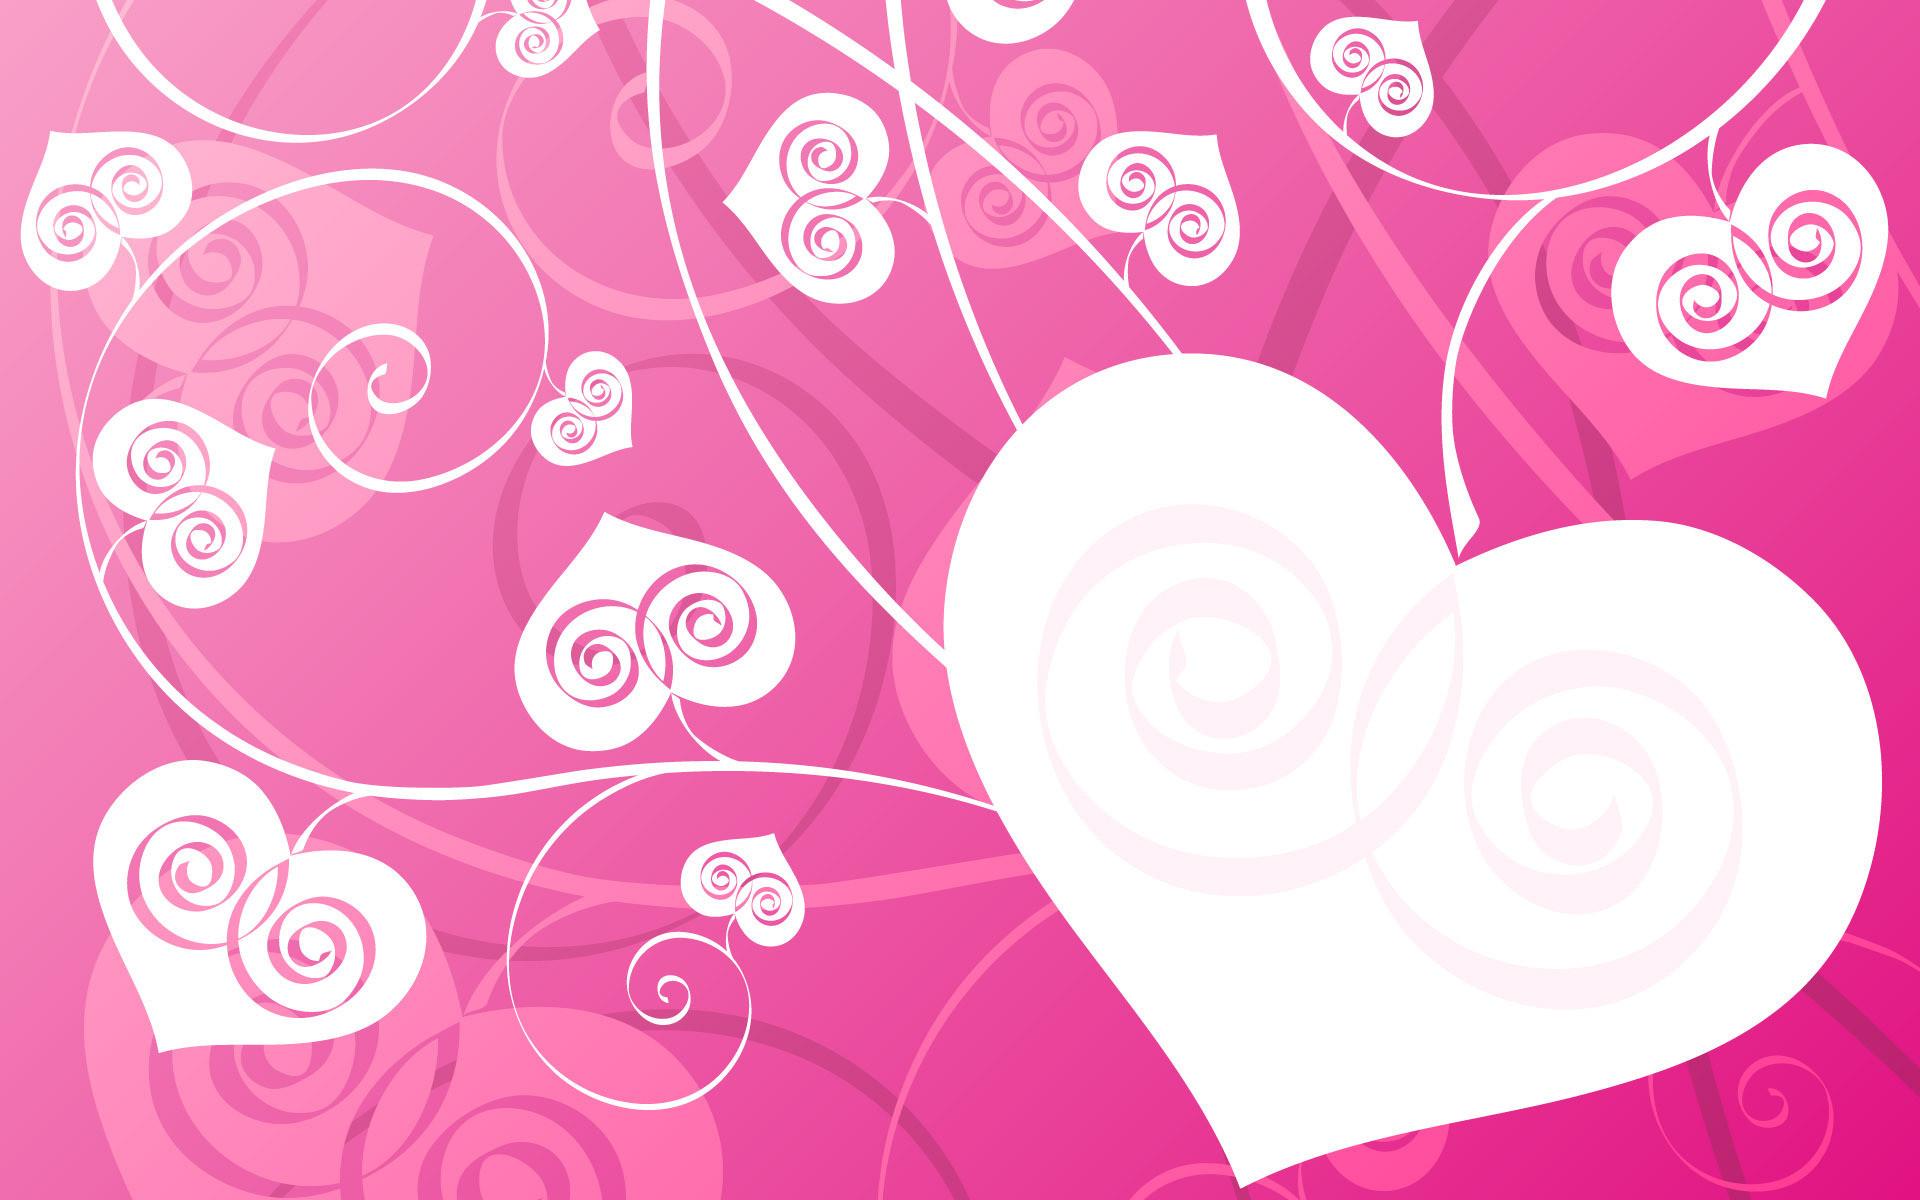 Heart, Love, White, Pink, Vines